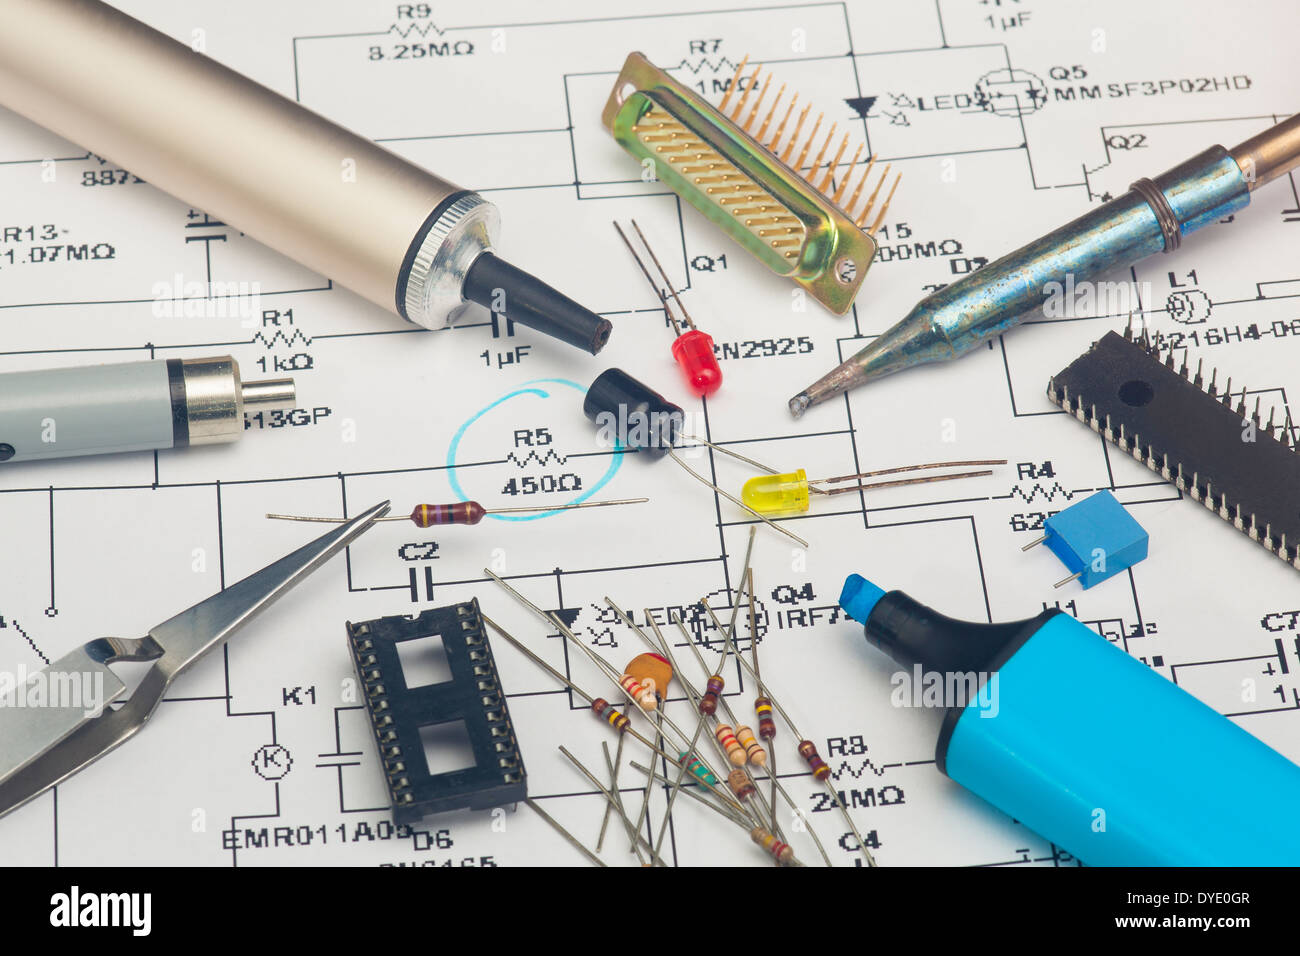 Resistor Electronic Electronics Components Stockfotos & Resistor ...